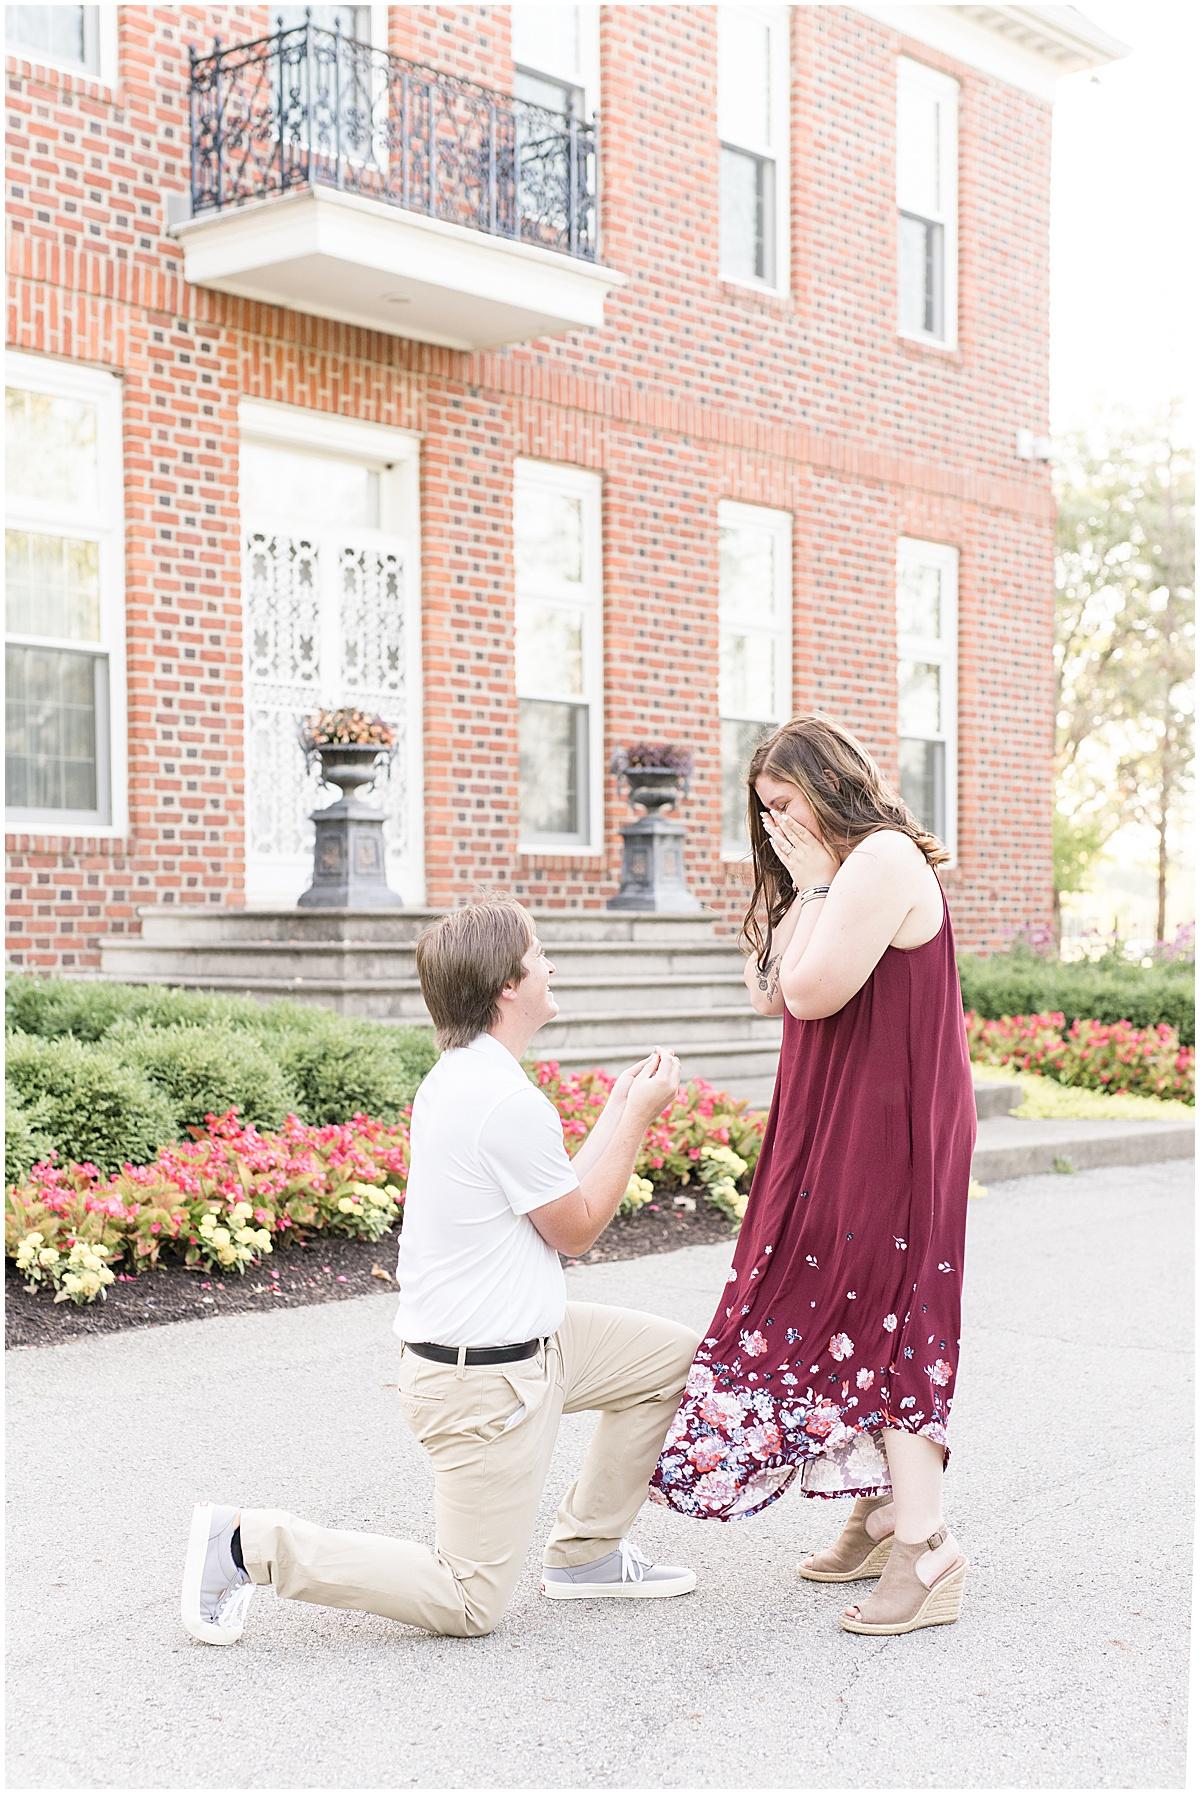 Proposal photos at Coxhall Gardens in Carmel, Indiana